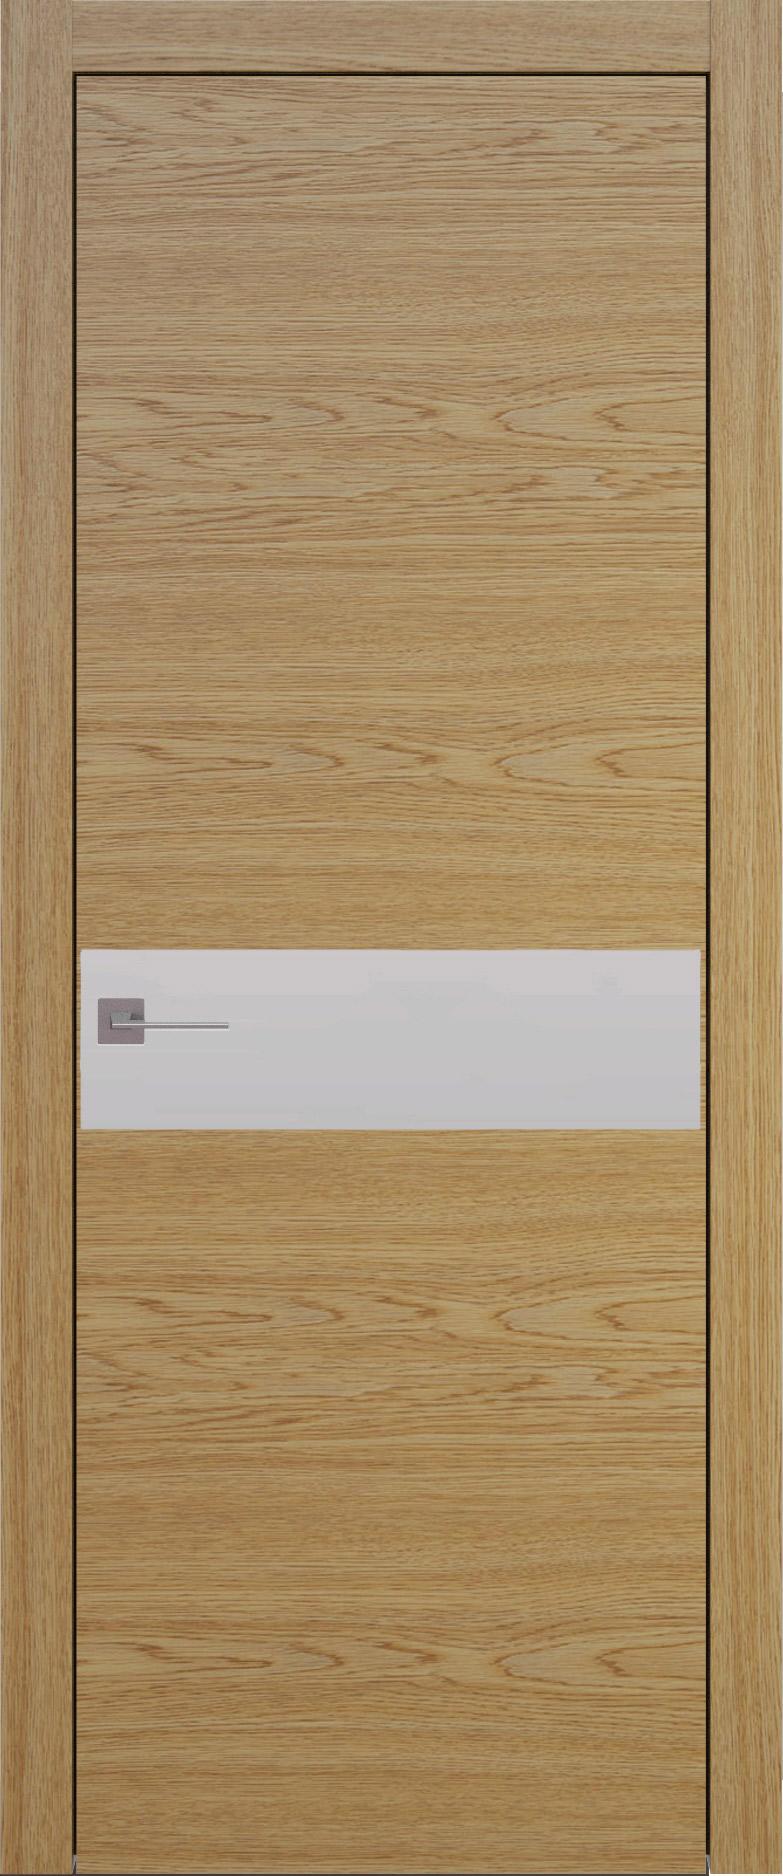 Tivoli И-4 цвет - Дуб карамель Без стекла (ДГ)